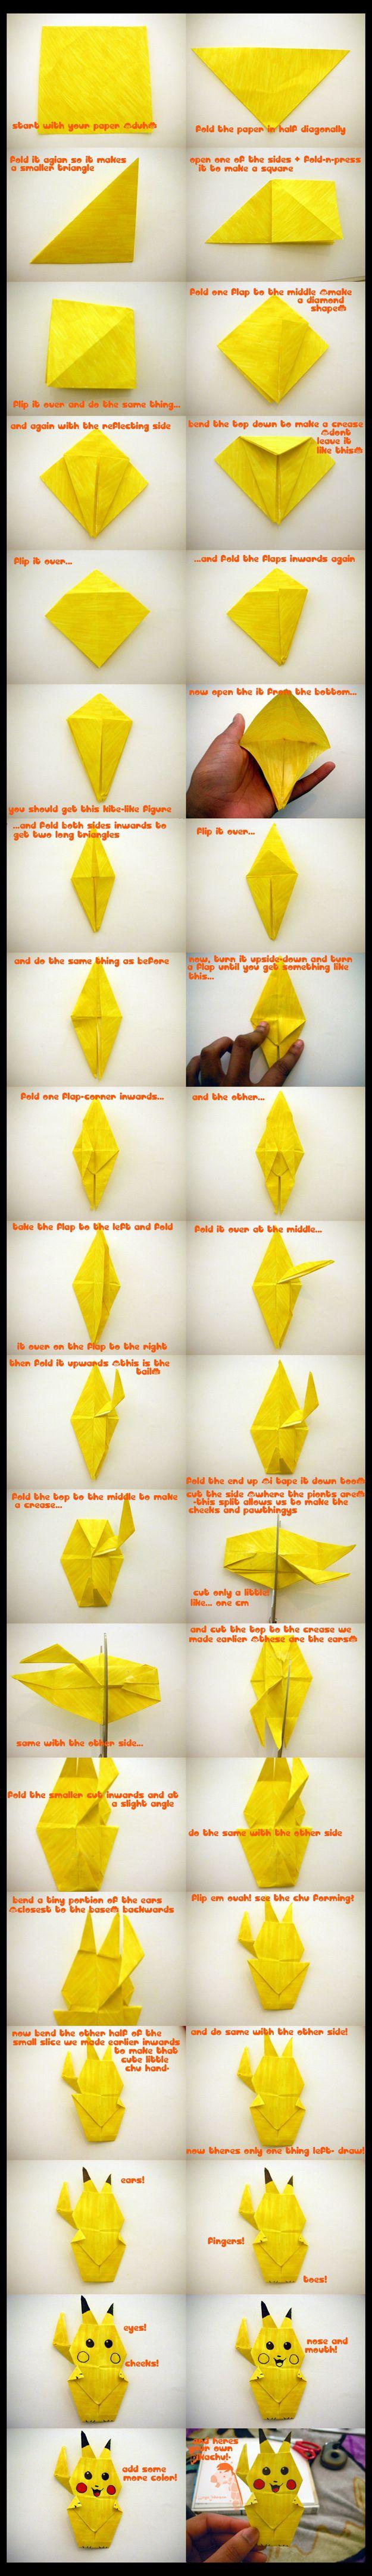 how to make an origami pikachu pikachu de papel